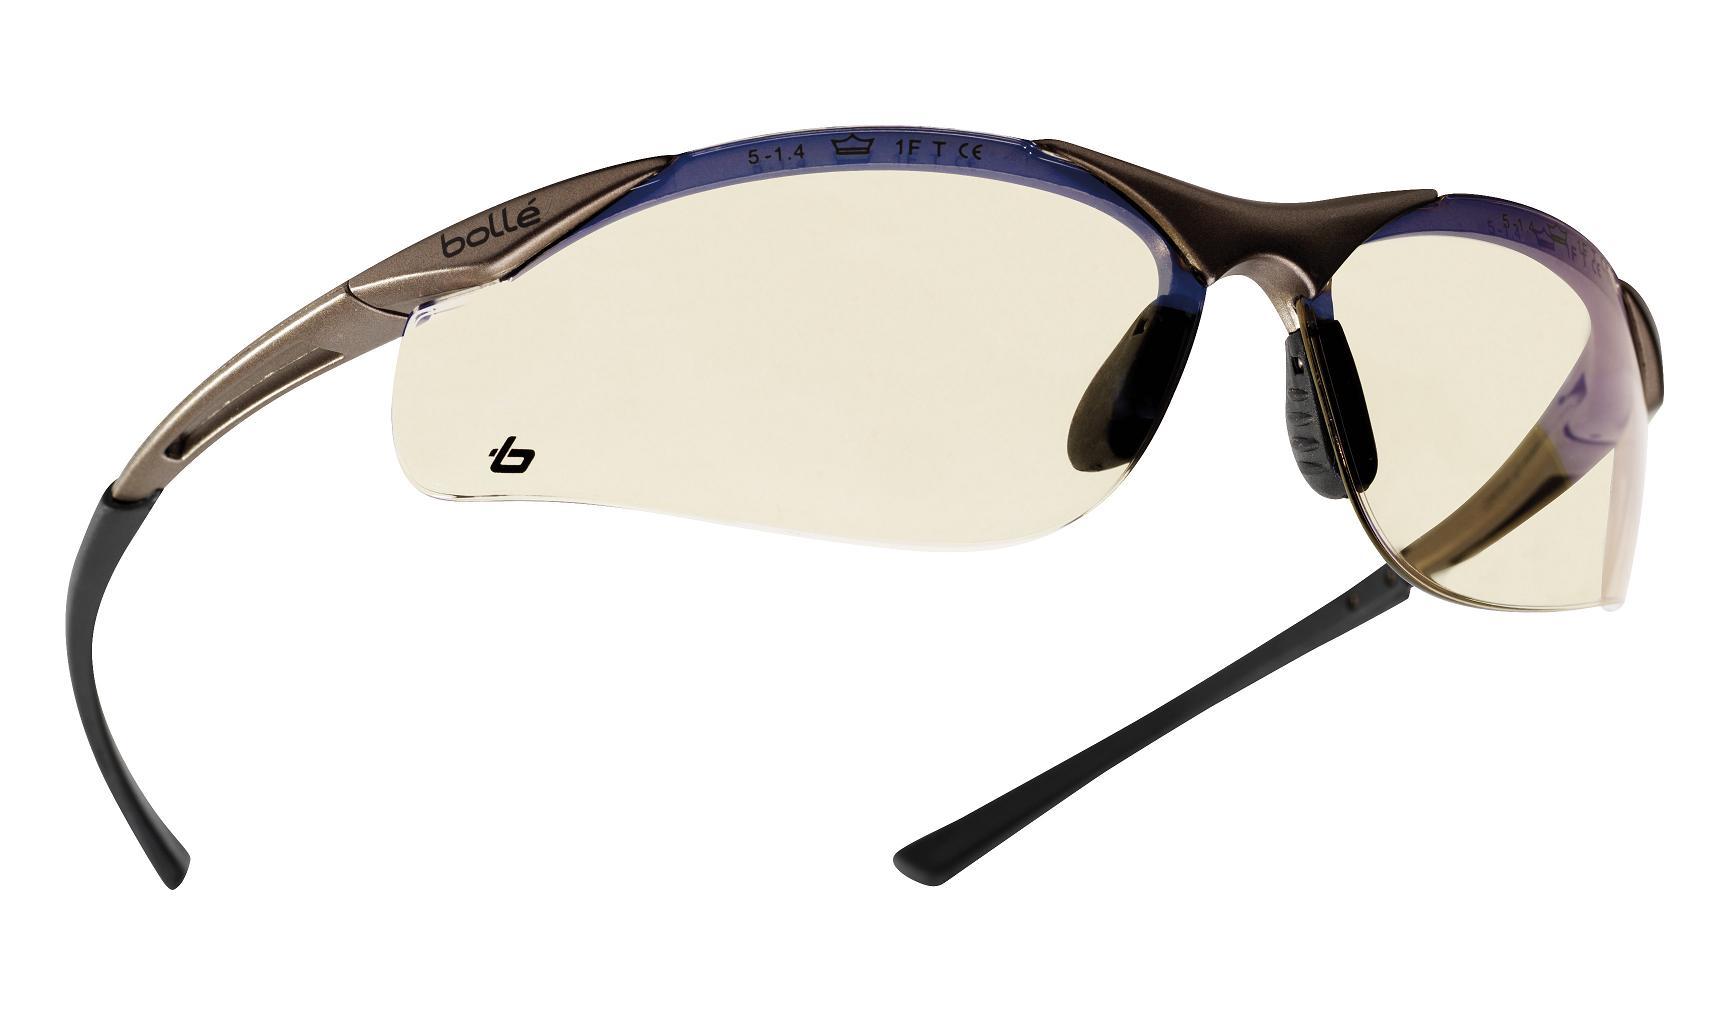 Bolle Contour ESP Safety Glasses